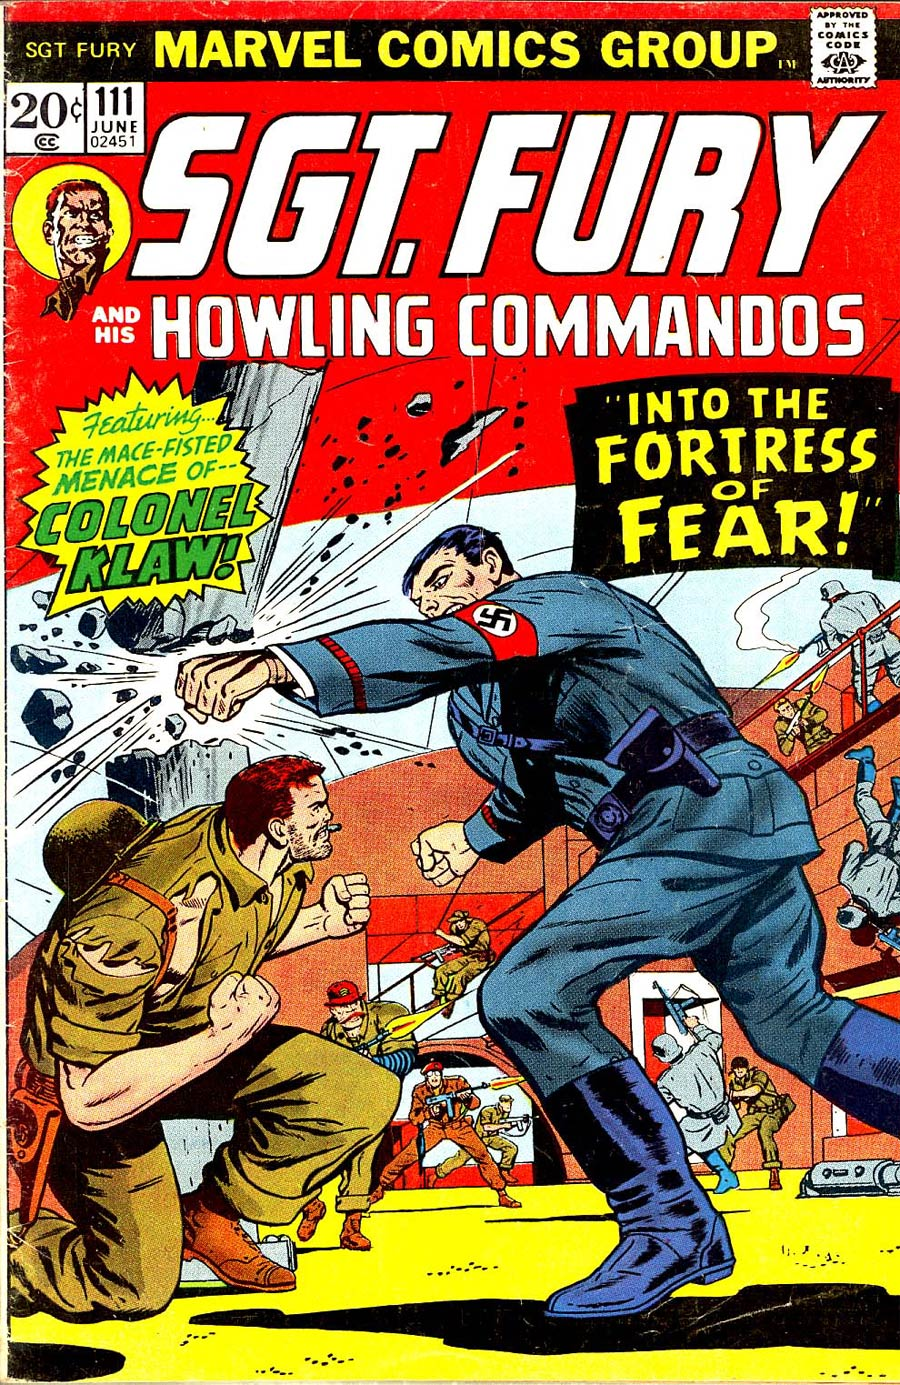 Sgt. Fury & His Howling Commandos #111